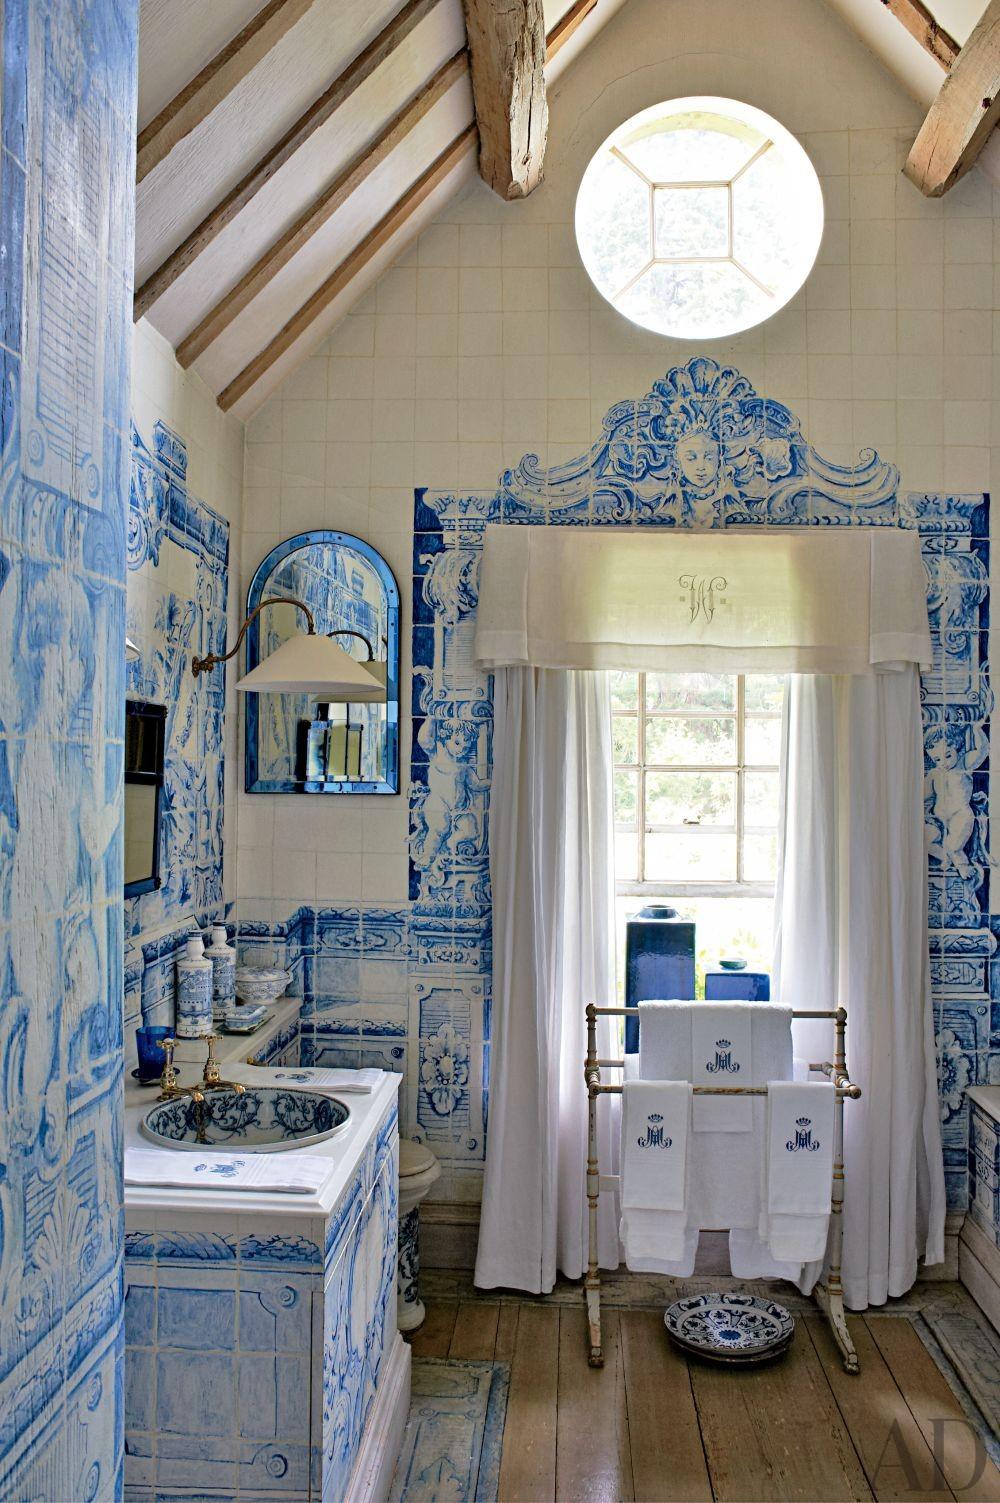 Traditional Bathroom by Anouska Hempel Design in Wiltshire, England